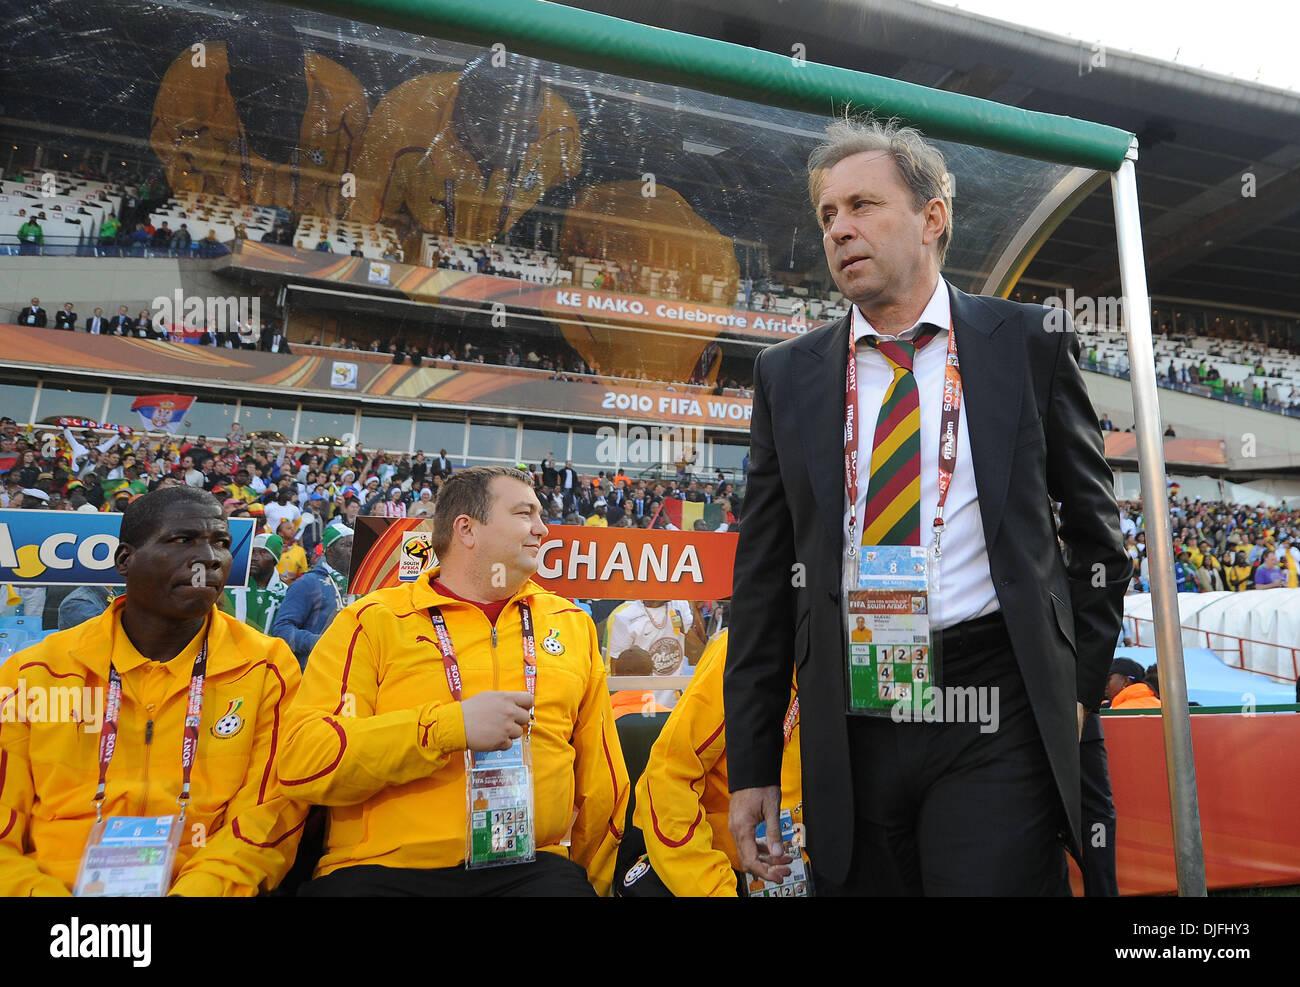 Ghana Coach Milovan Rajevac High Resolution Stock Photography and Images - Alamy